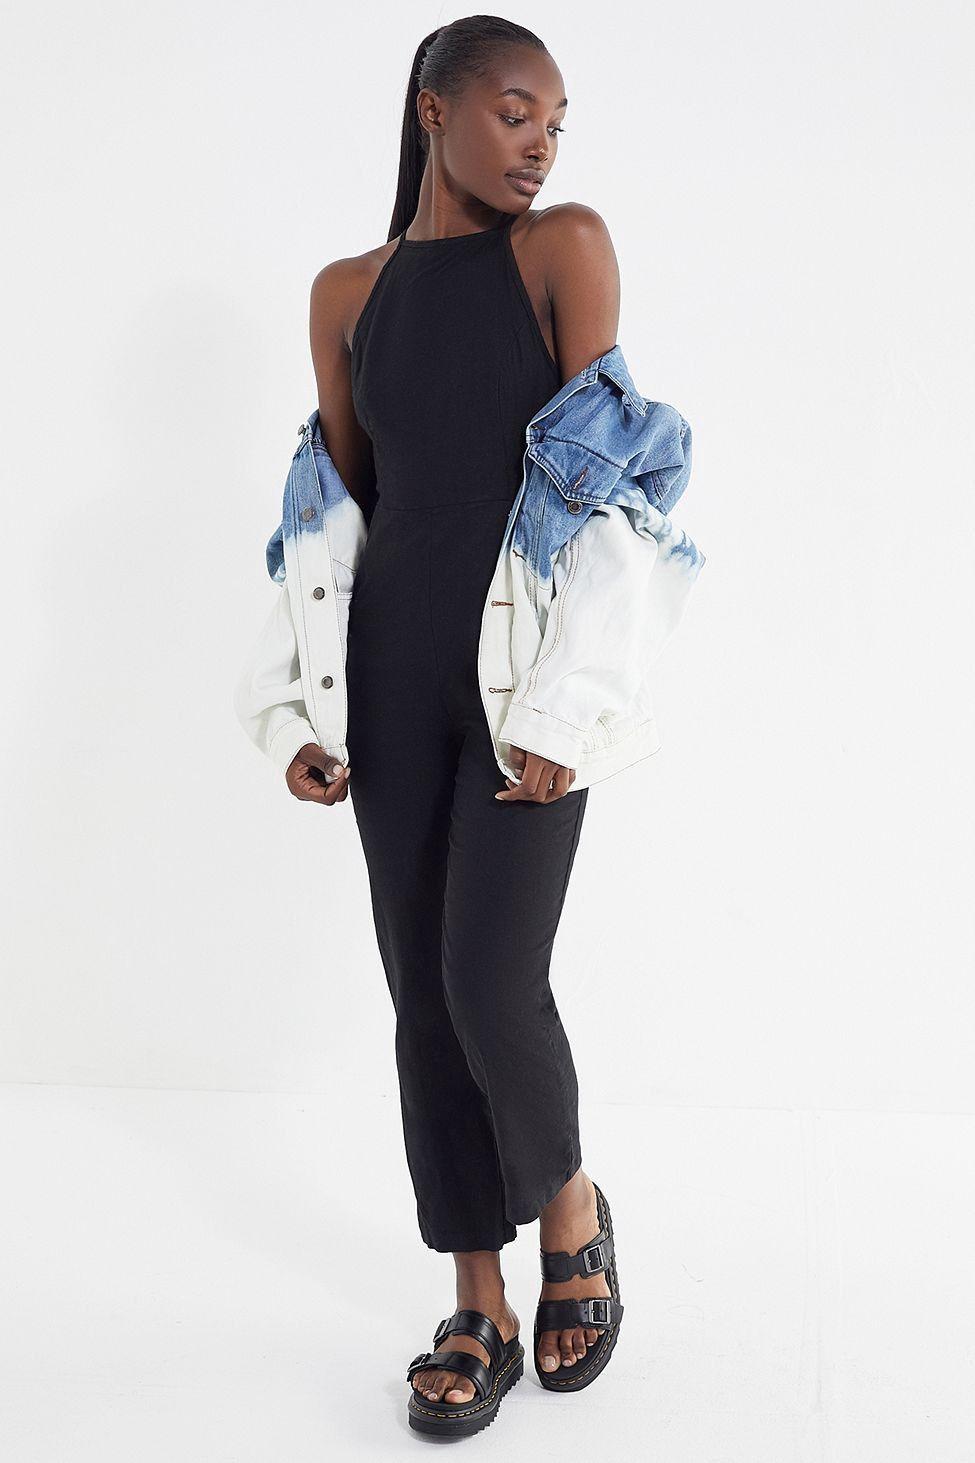 77e775ecf85 Urban Outfitters Uo Hattie High-Neck Linen Jumpsuit - Black + White 10 Navy